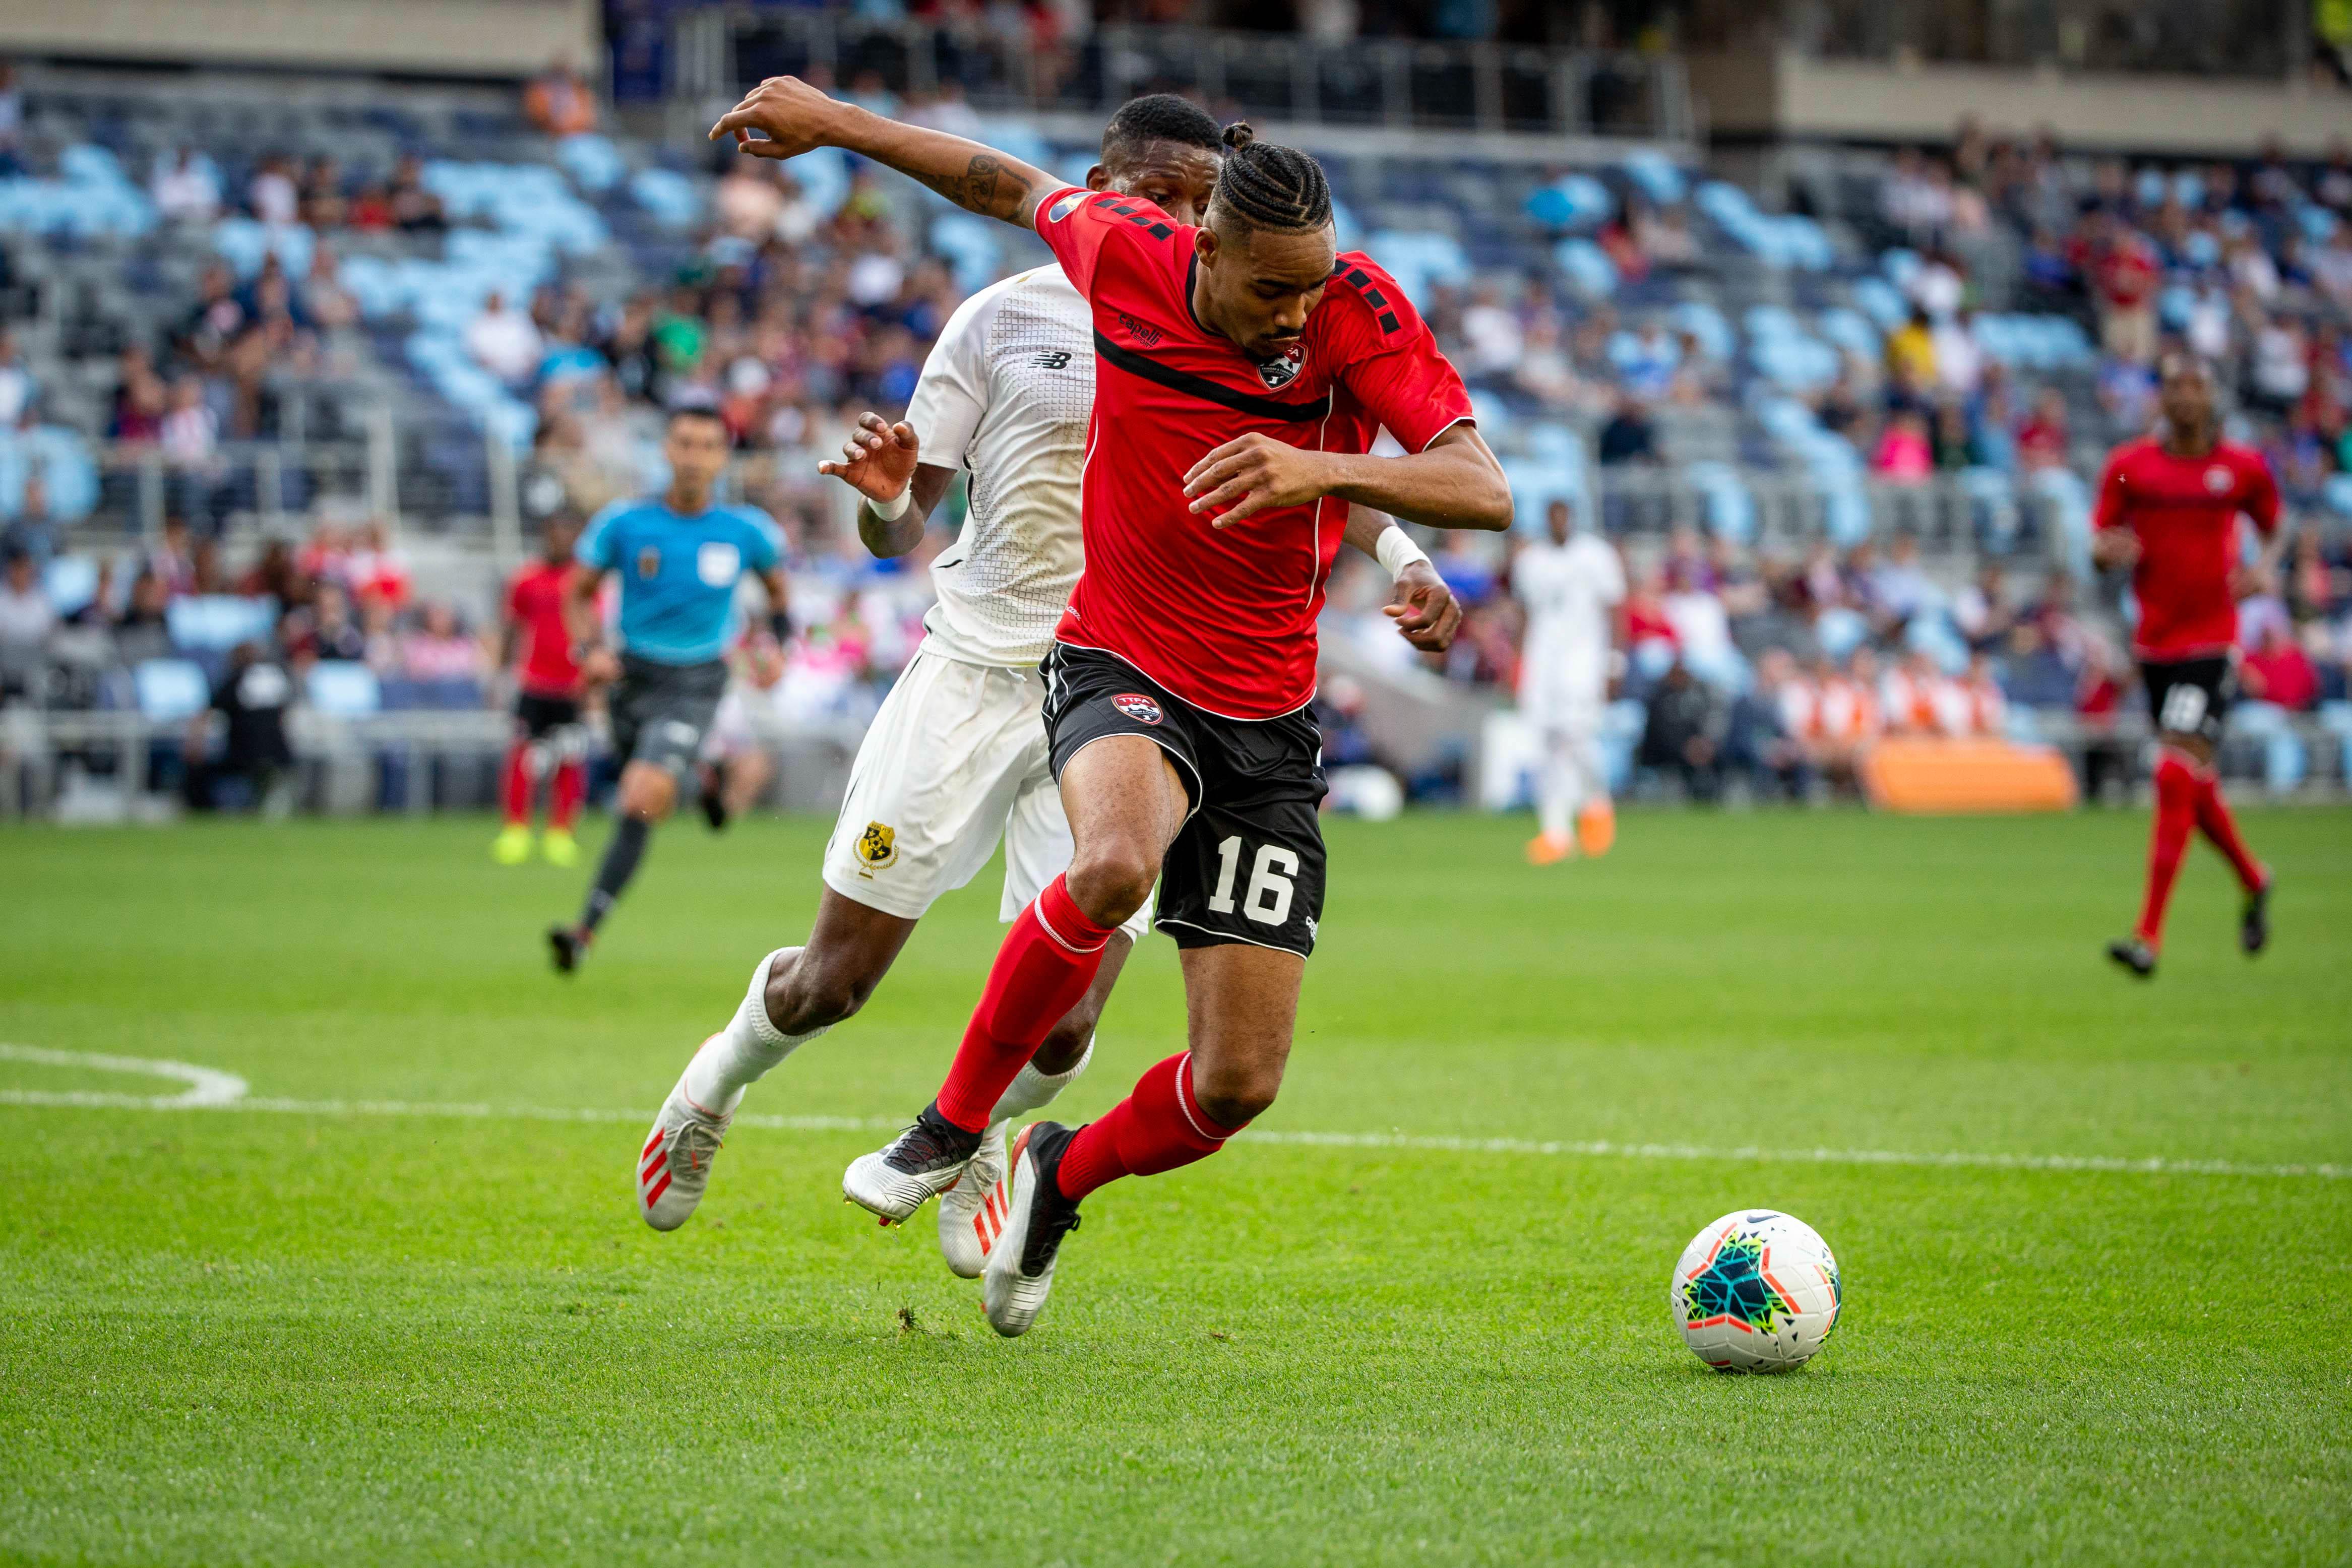 Soccer: CONCACAF Gold Cup-Panama at Trinidad and Tobago